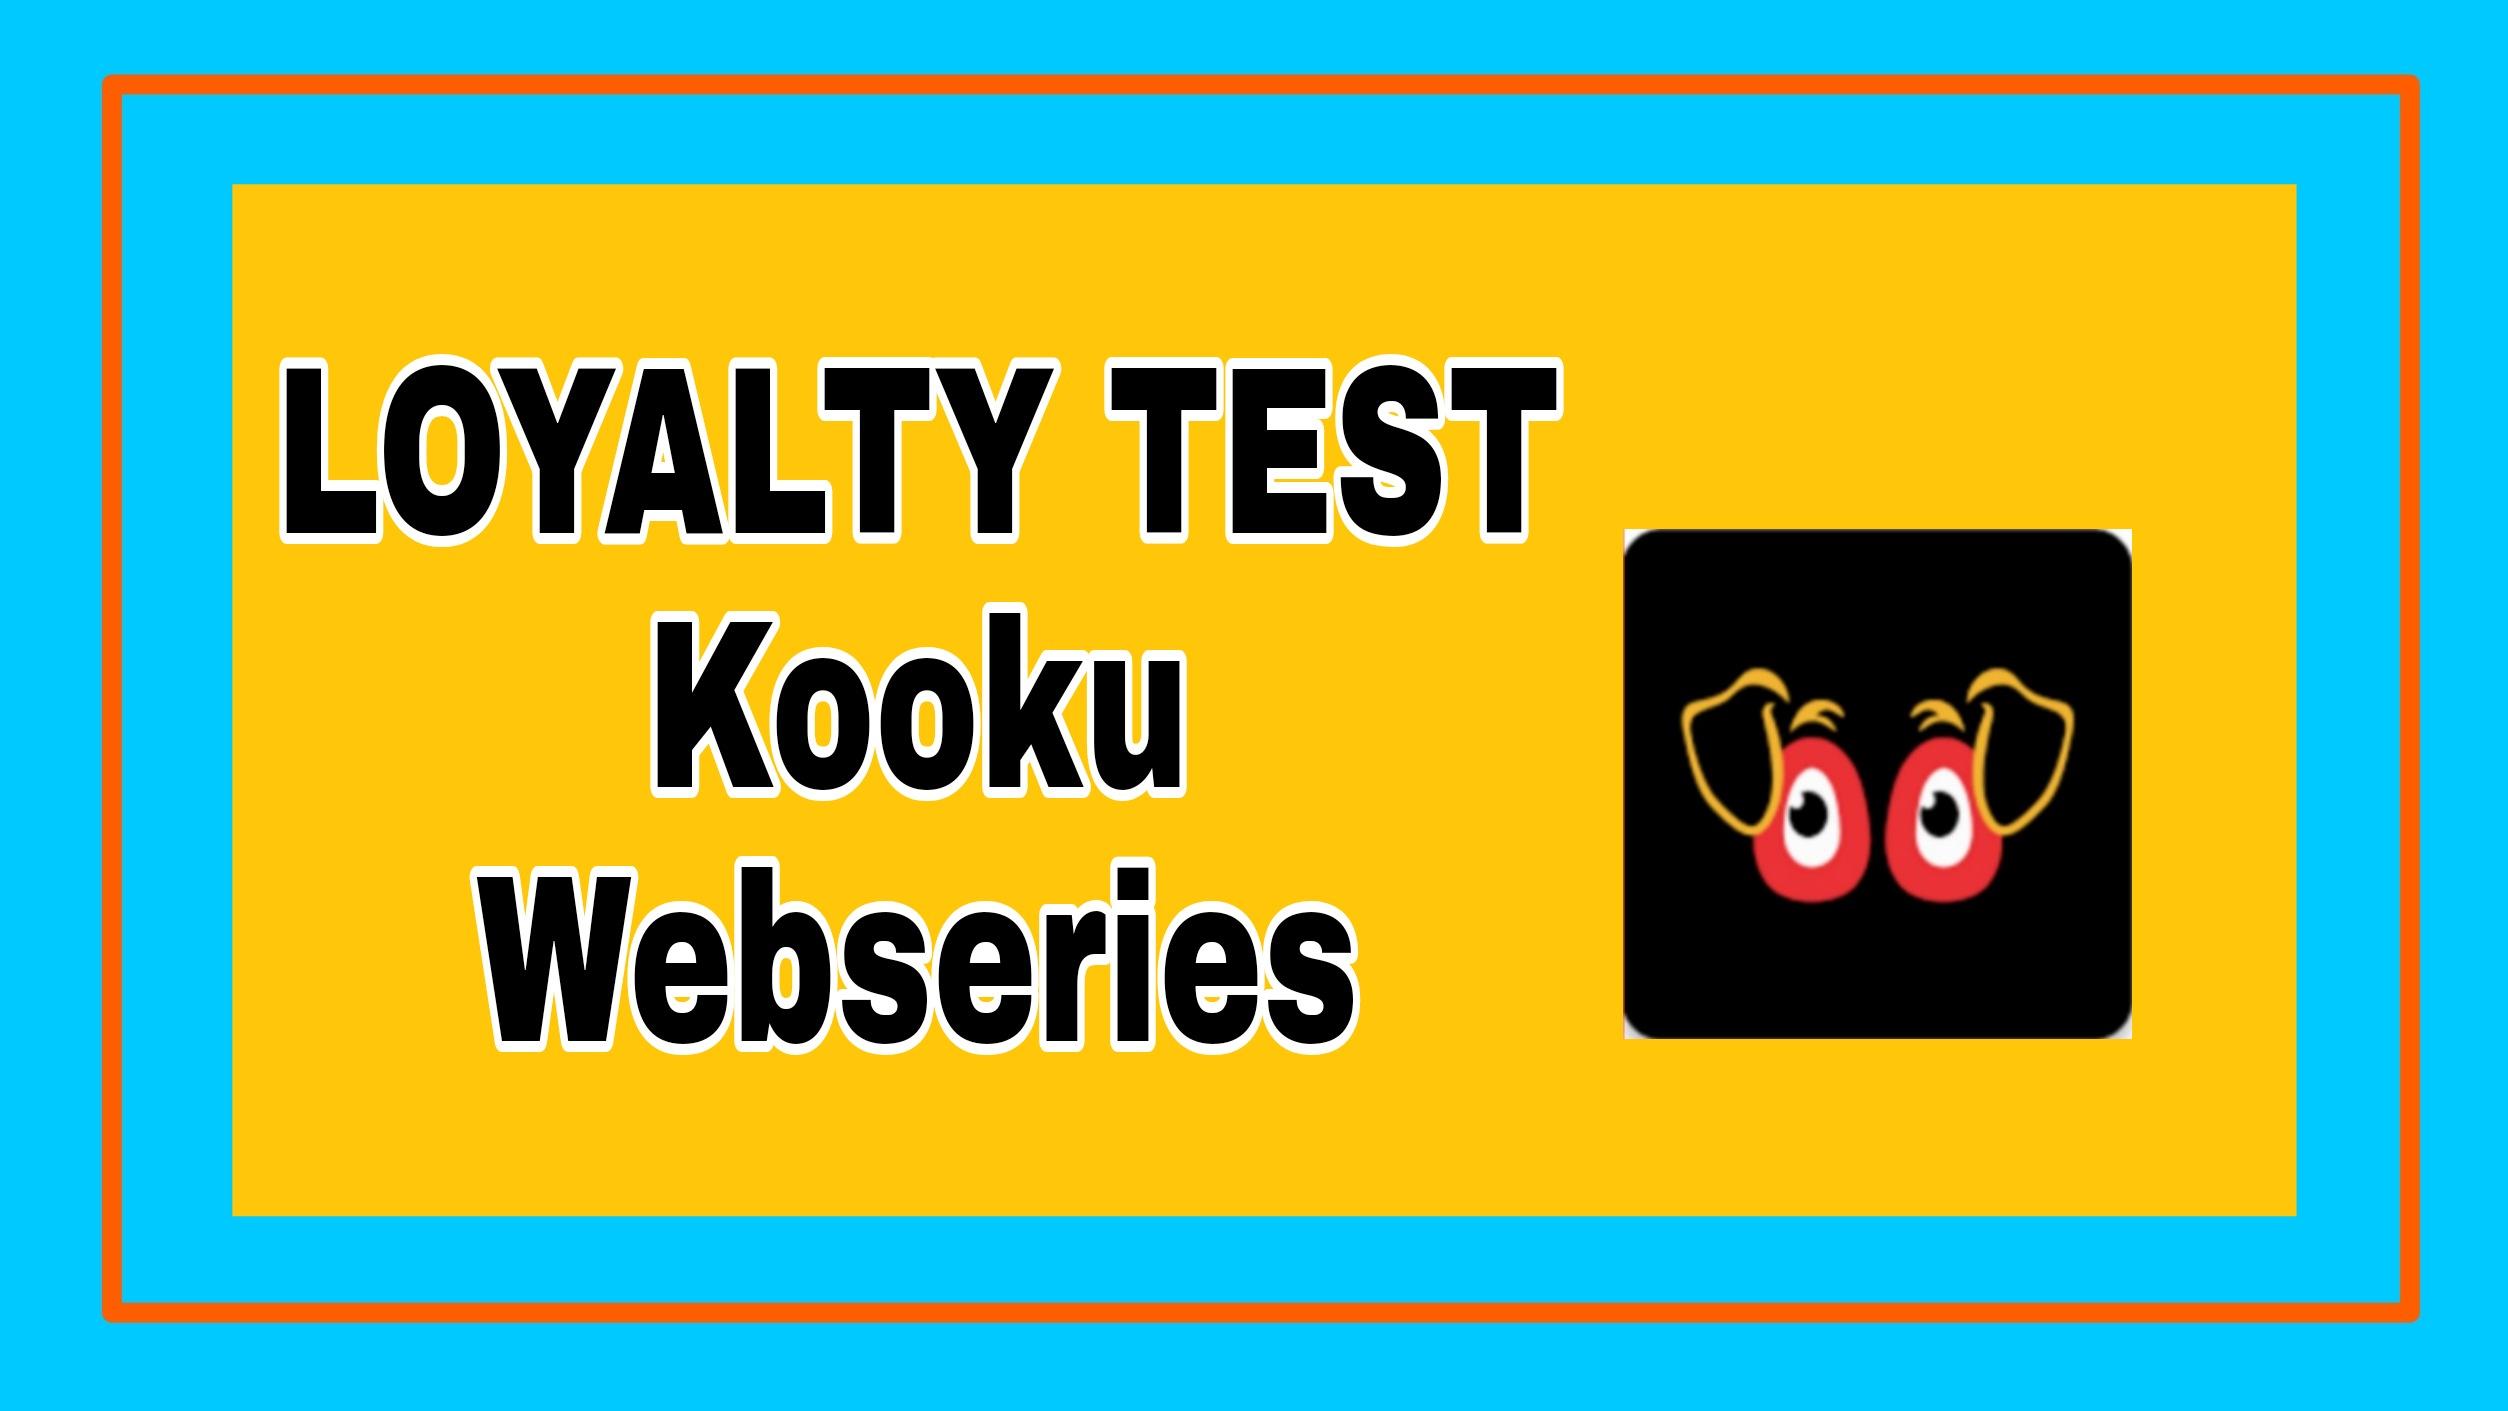 LOYALTY TEST Kooku